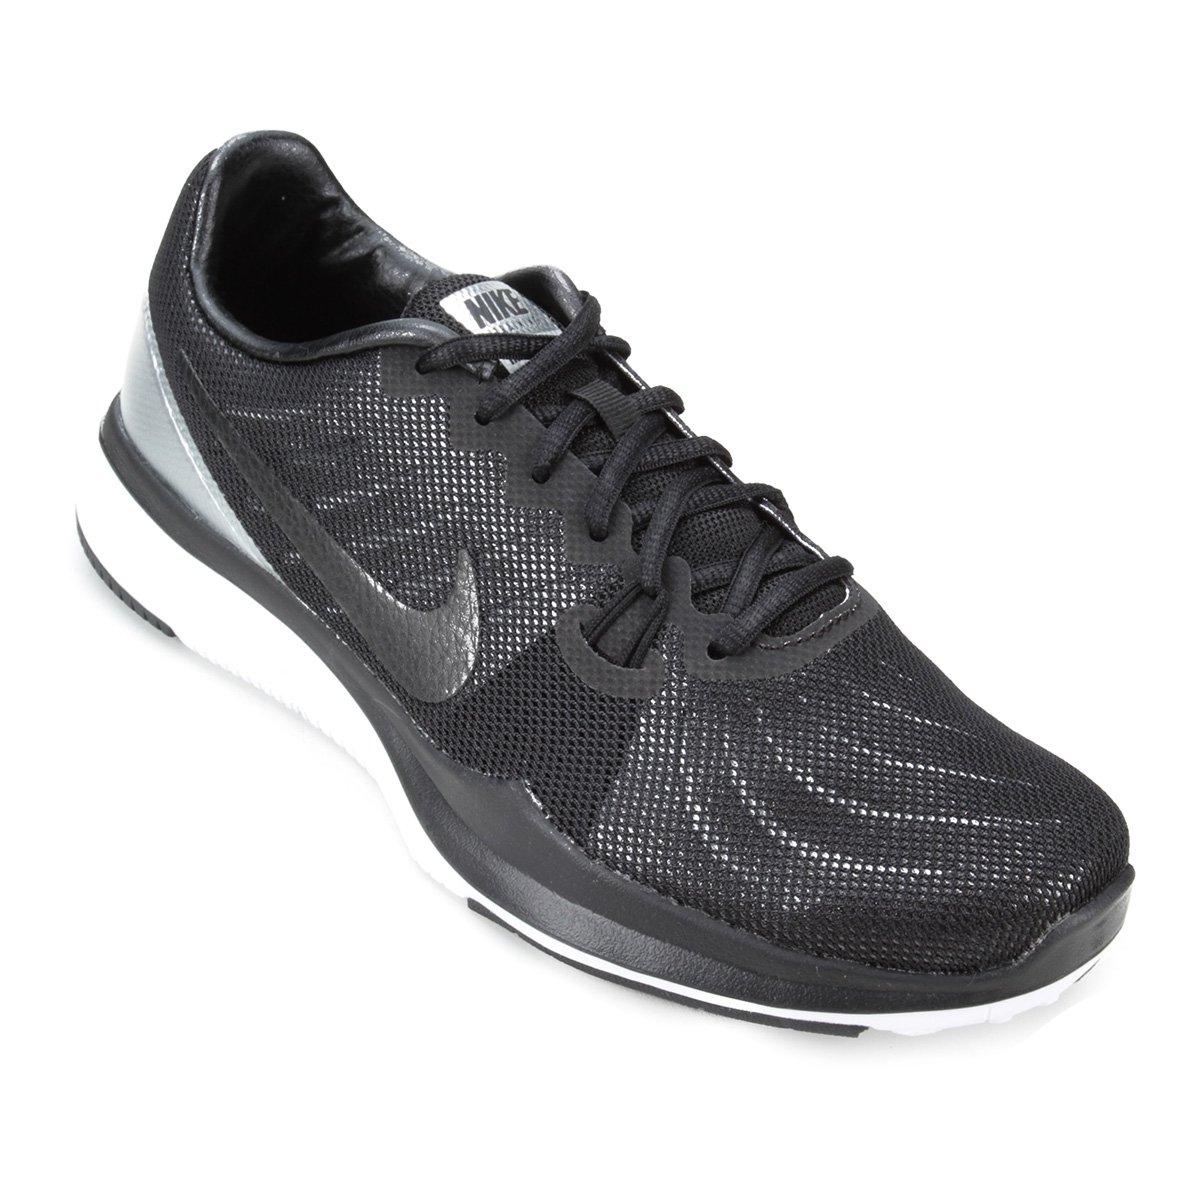 1e2efe32ddb8f Tênis Nike In-Season TR 7 PRM Feminino - Preto e Branco   Zattini